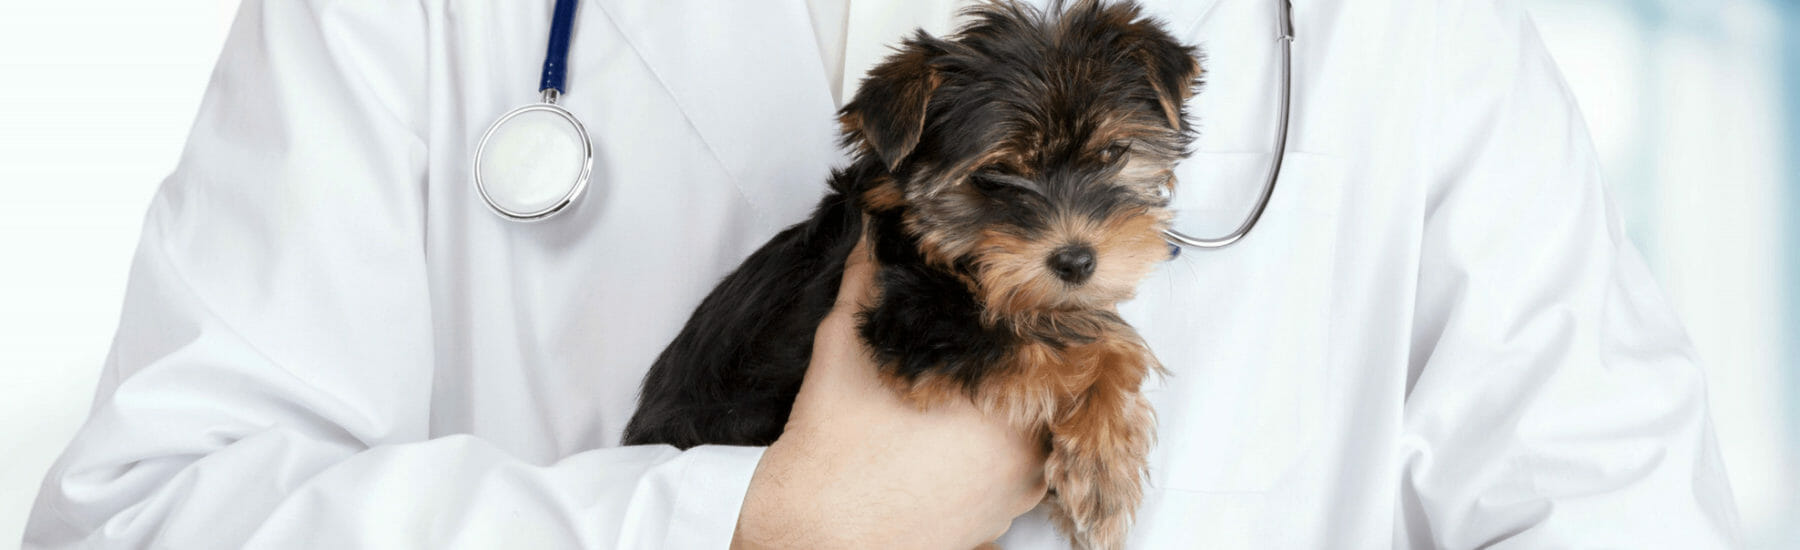 Laparoscopy Services for Pets